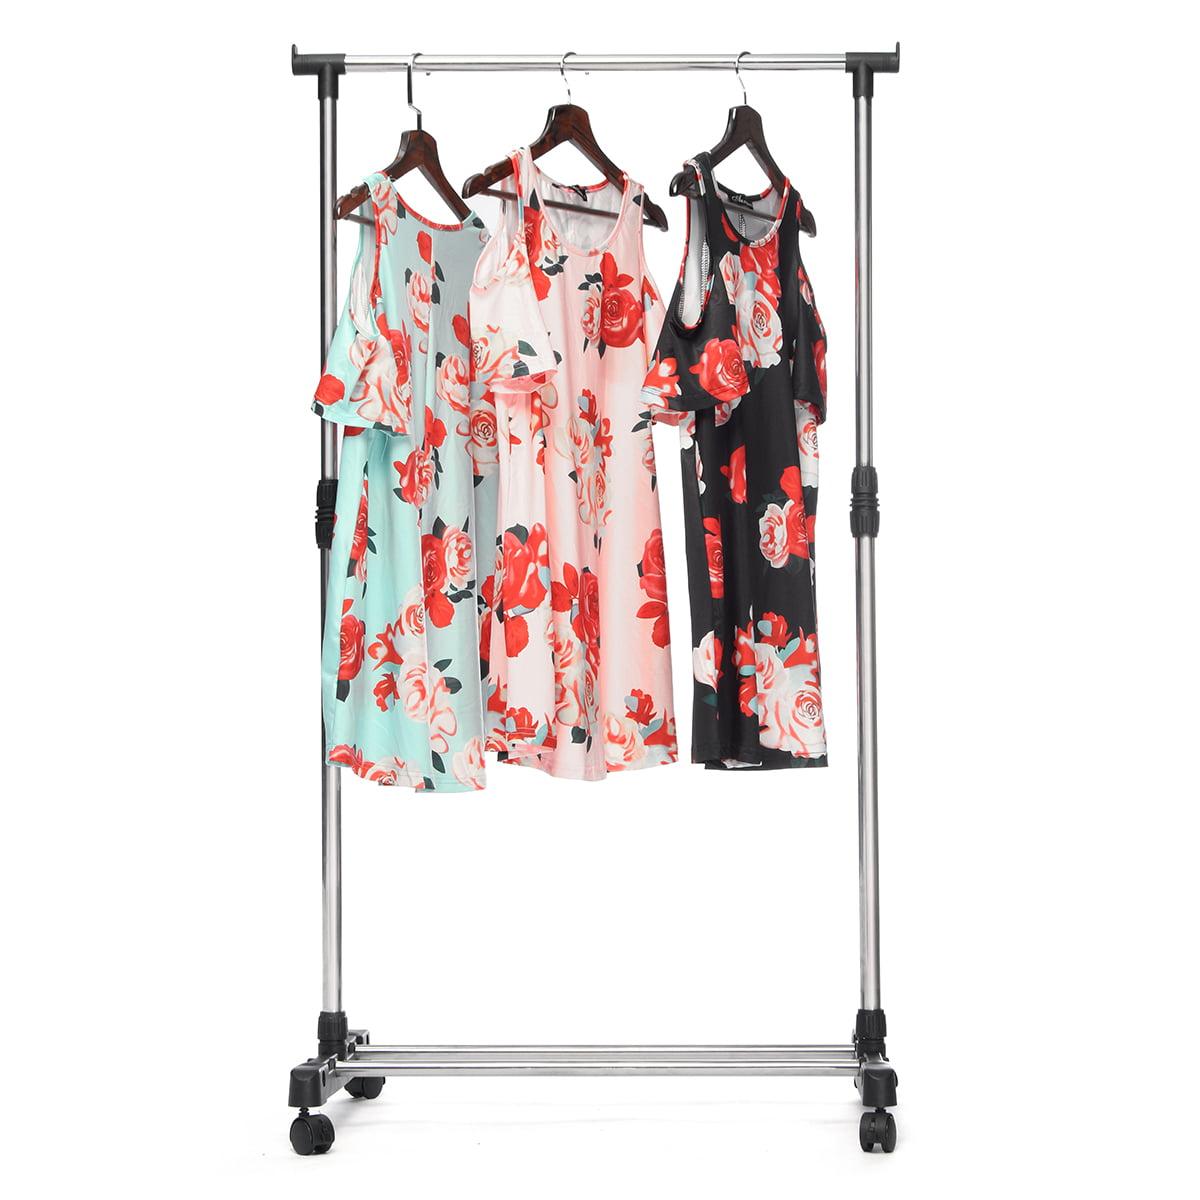 Clothes Coat Garment Dryer Rack Rail Hanging Hanger Hangers Adjustable -Double/Single Size